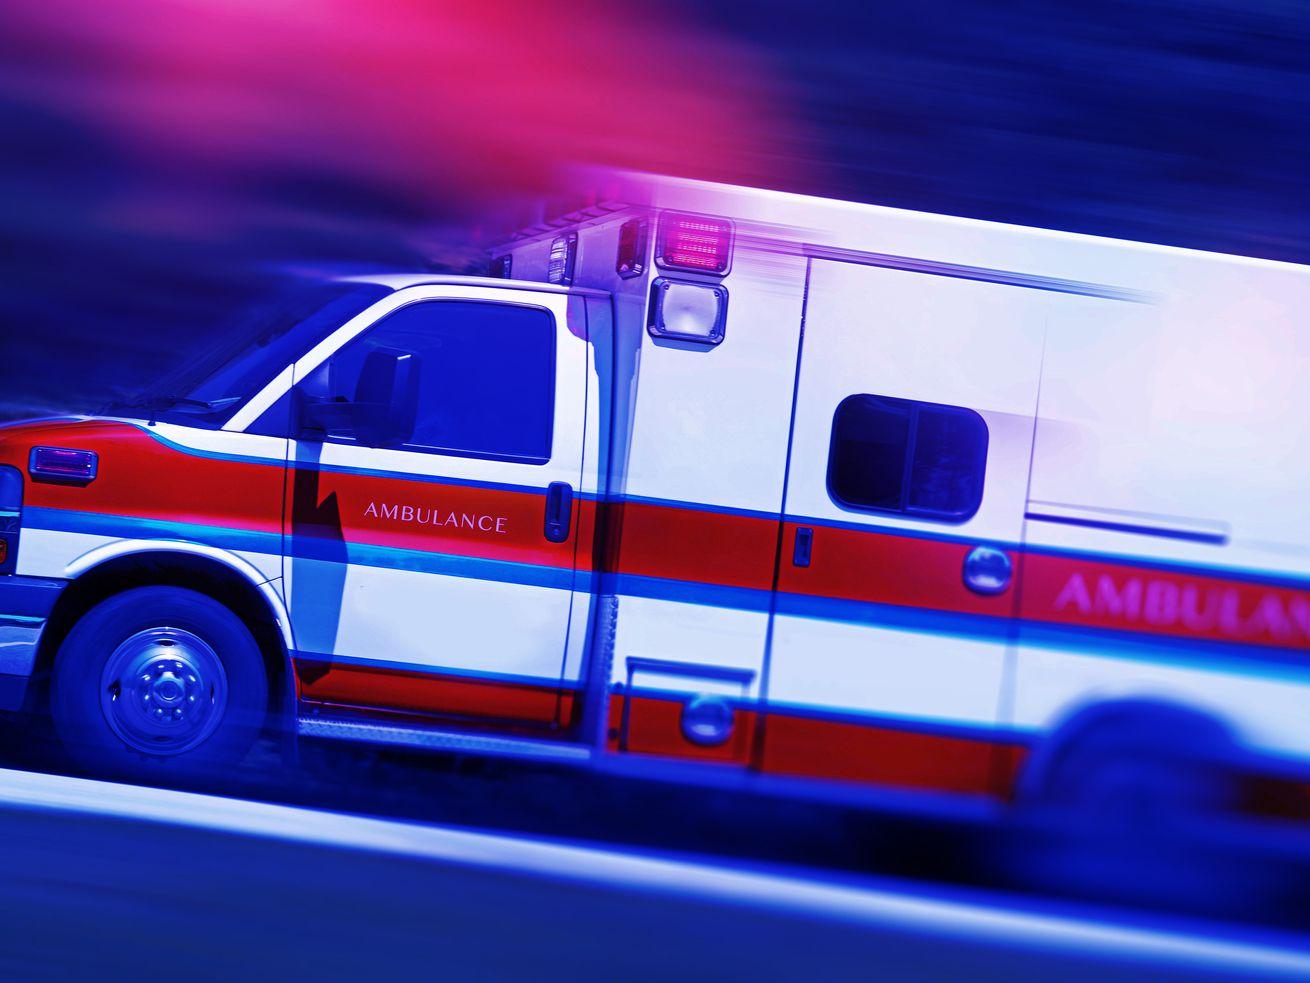 Idaho woman killed in Layton auto-pedestrian crash identified